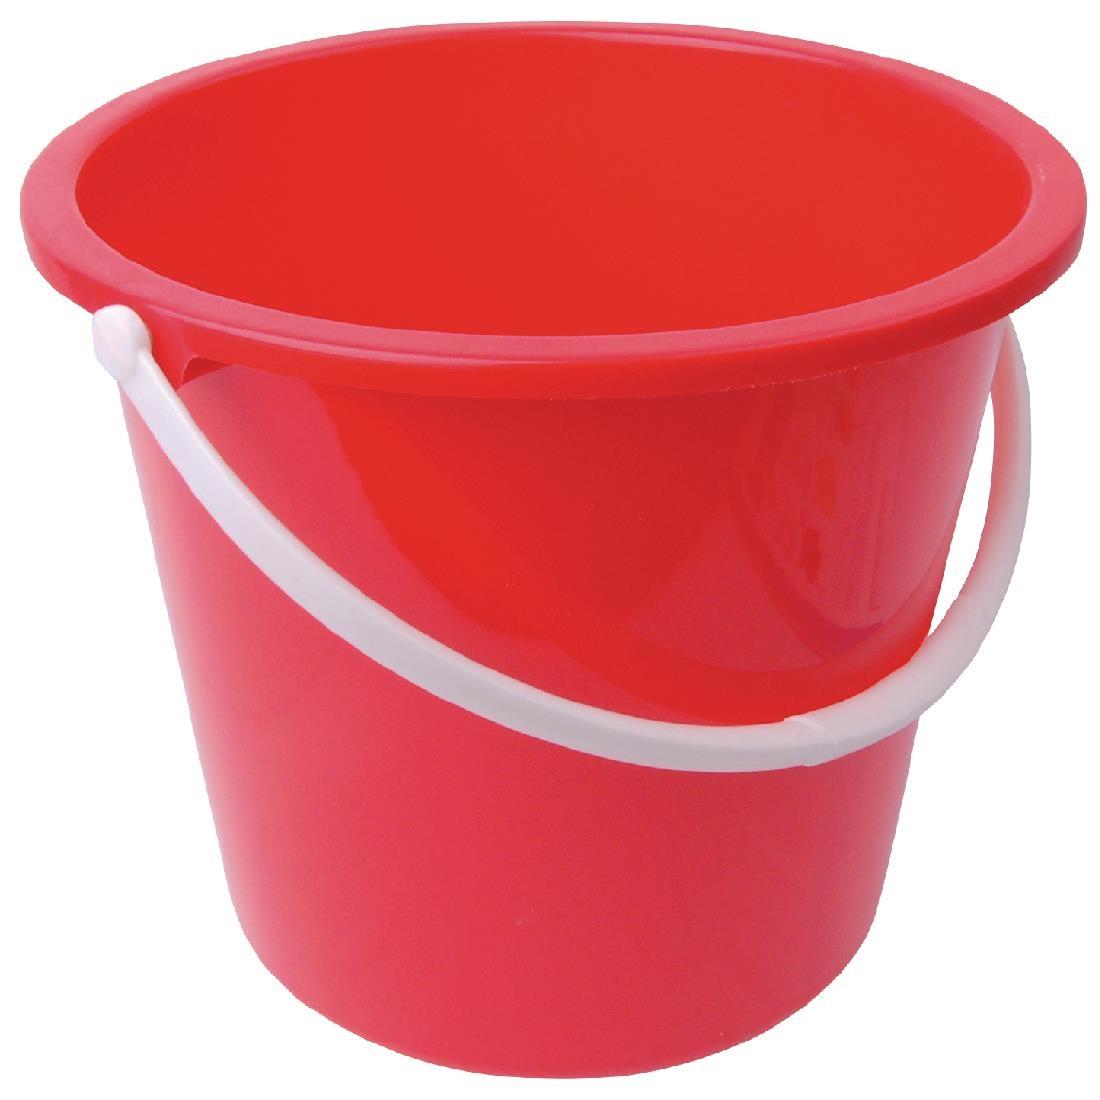 jantex round plastic bucket